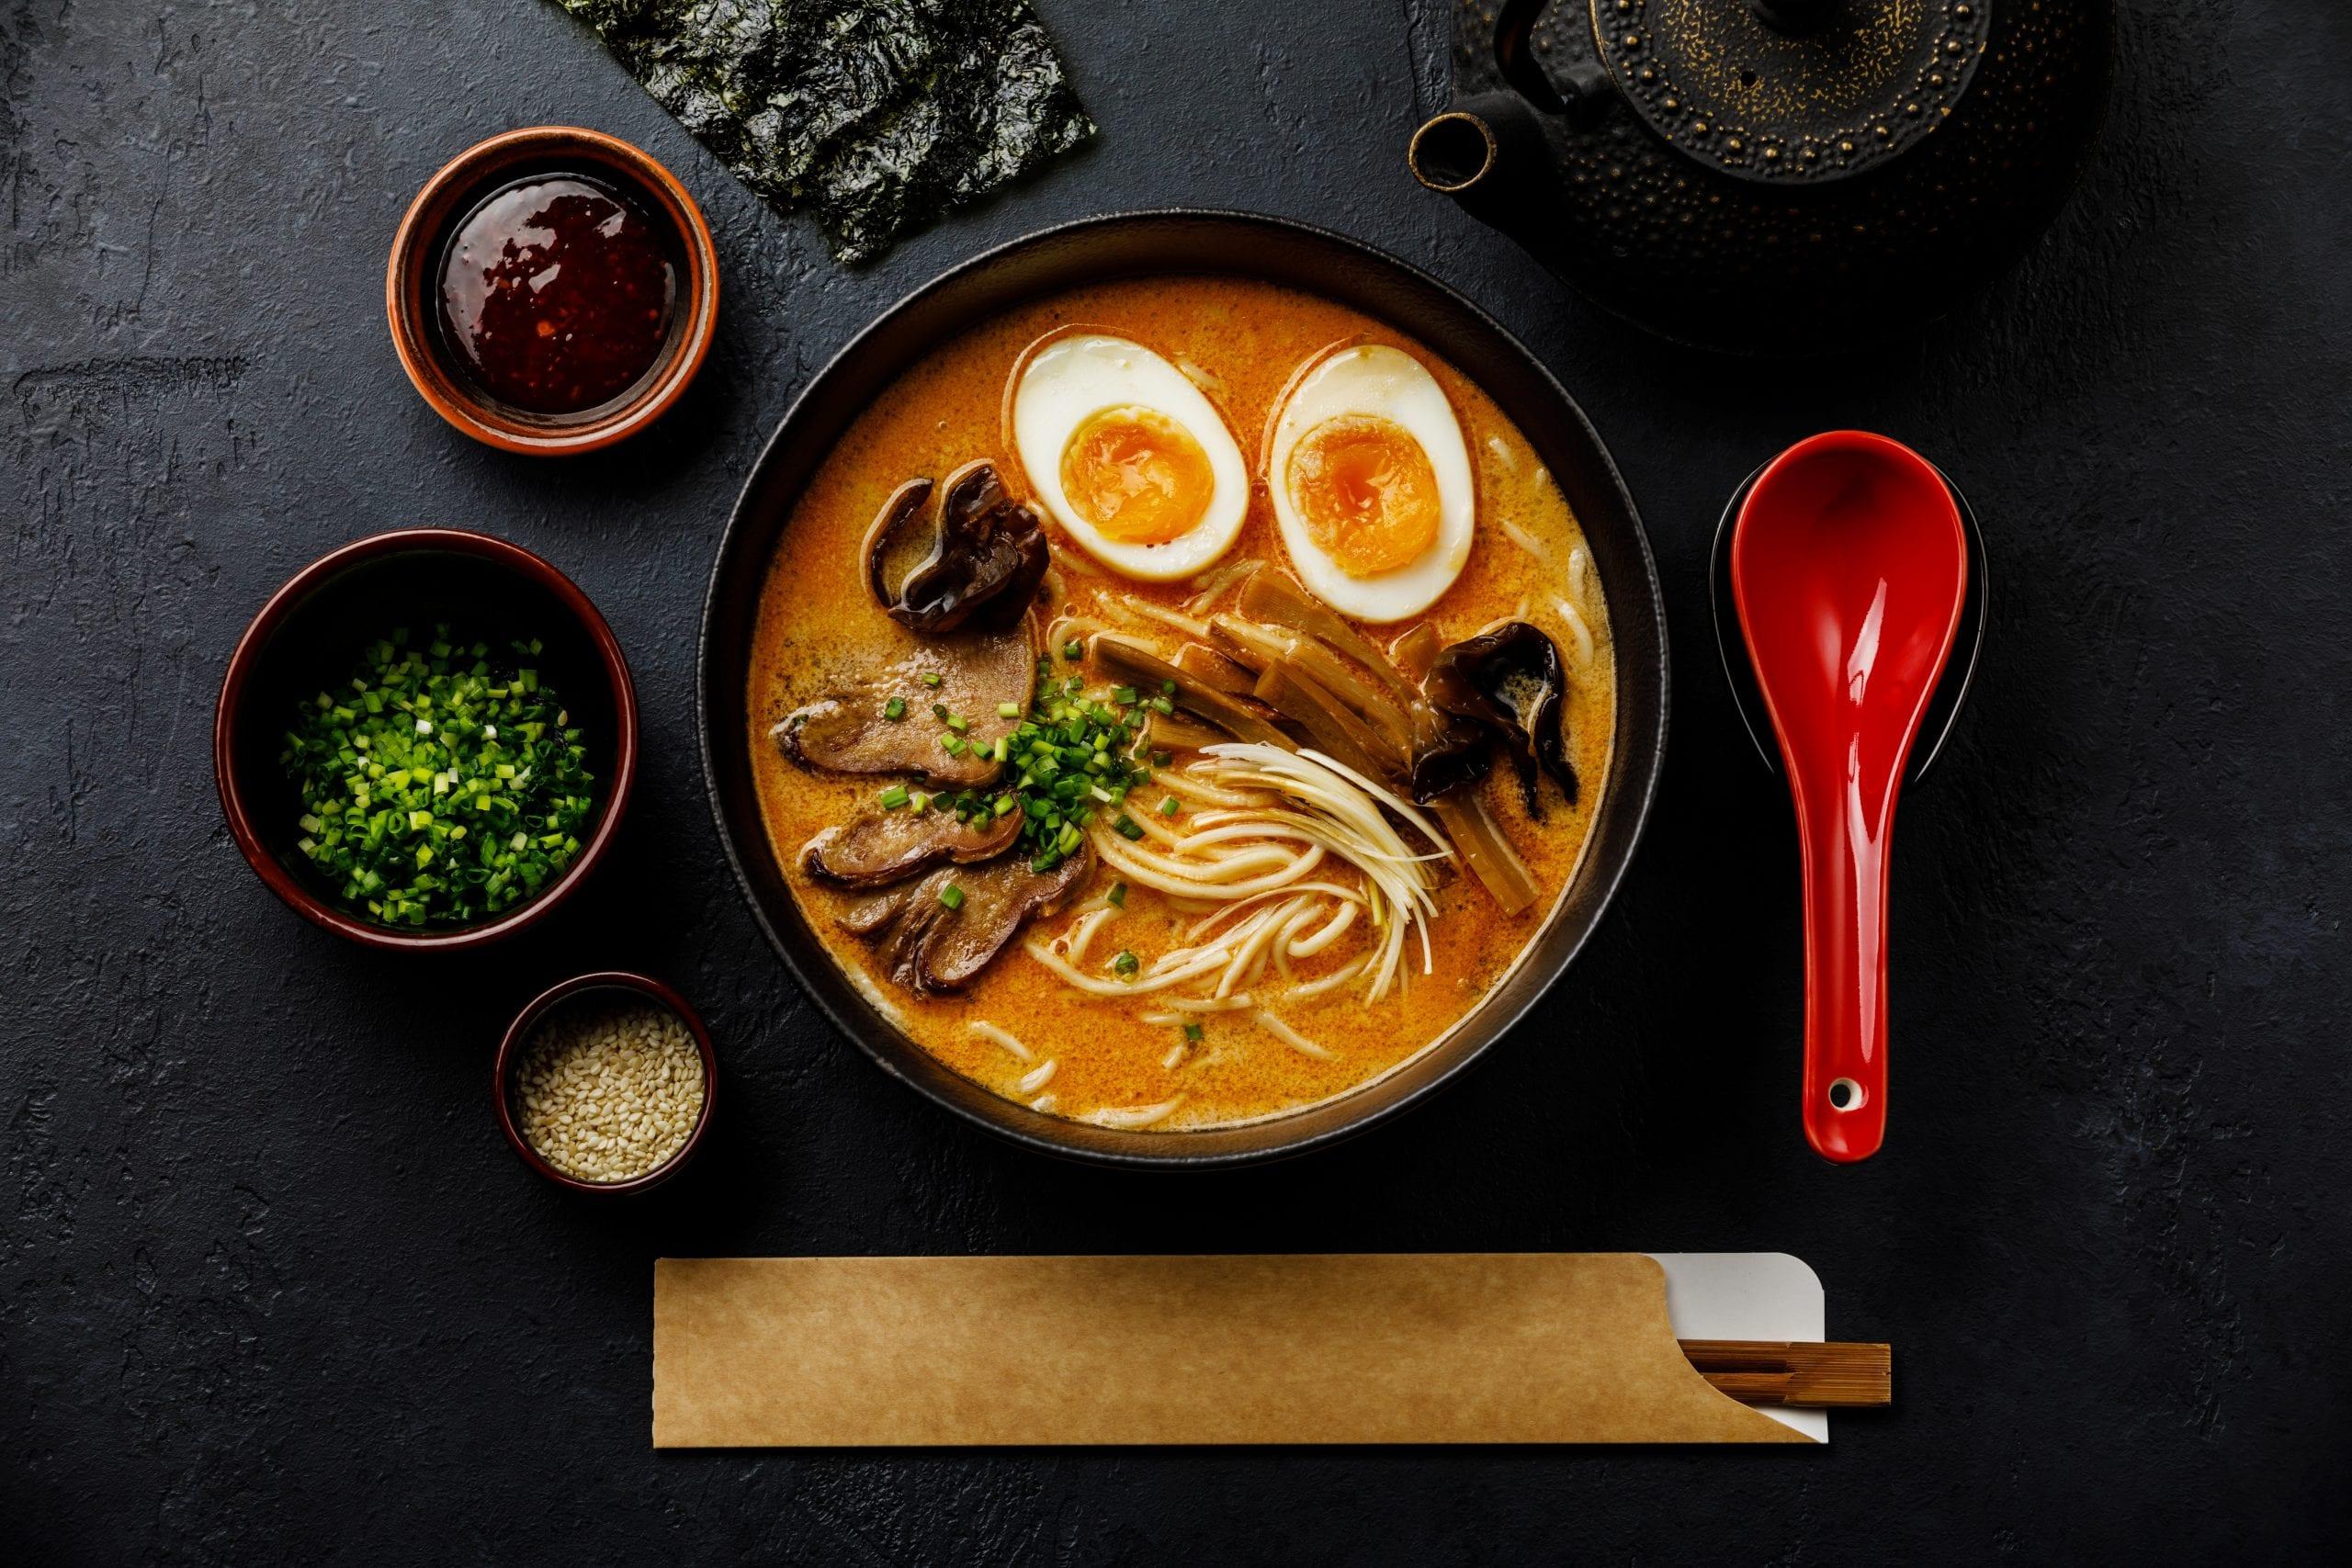 Ricetta Ramen Ai Gamberi.Ramen Giapponese Storia E Ricette Da Fare A Casa Gambero Rosso